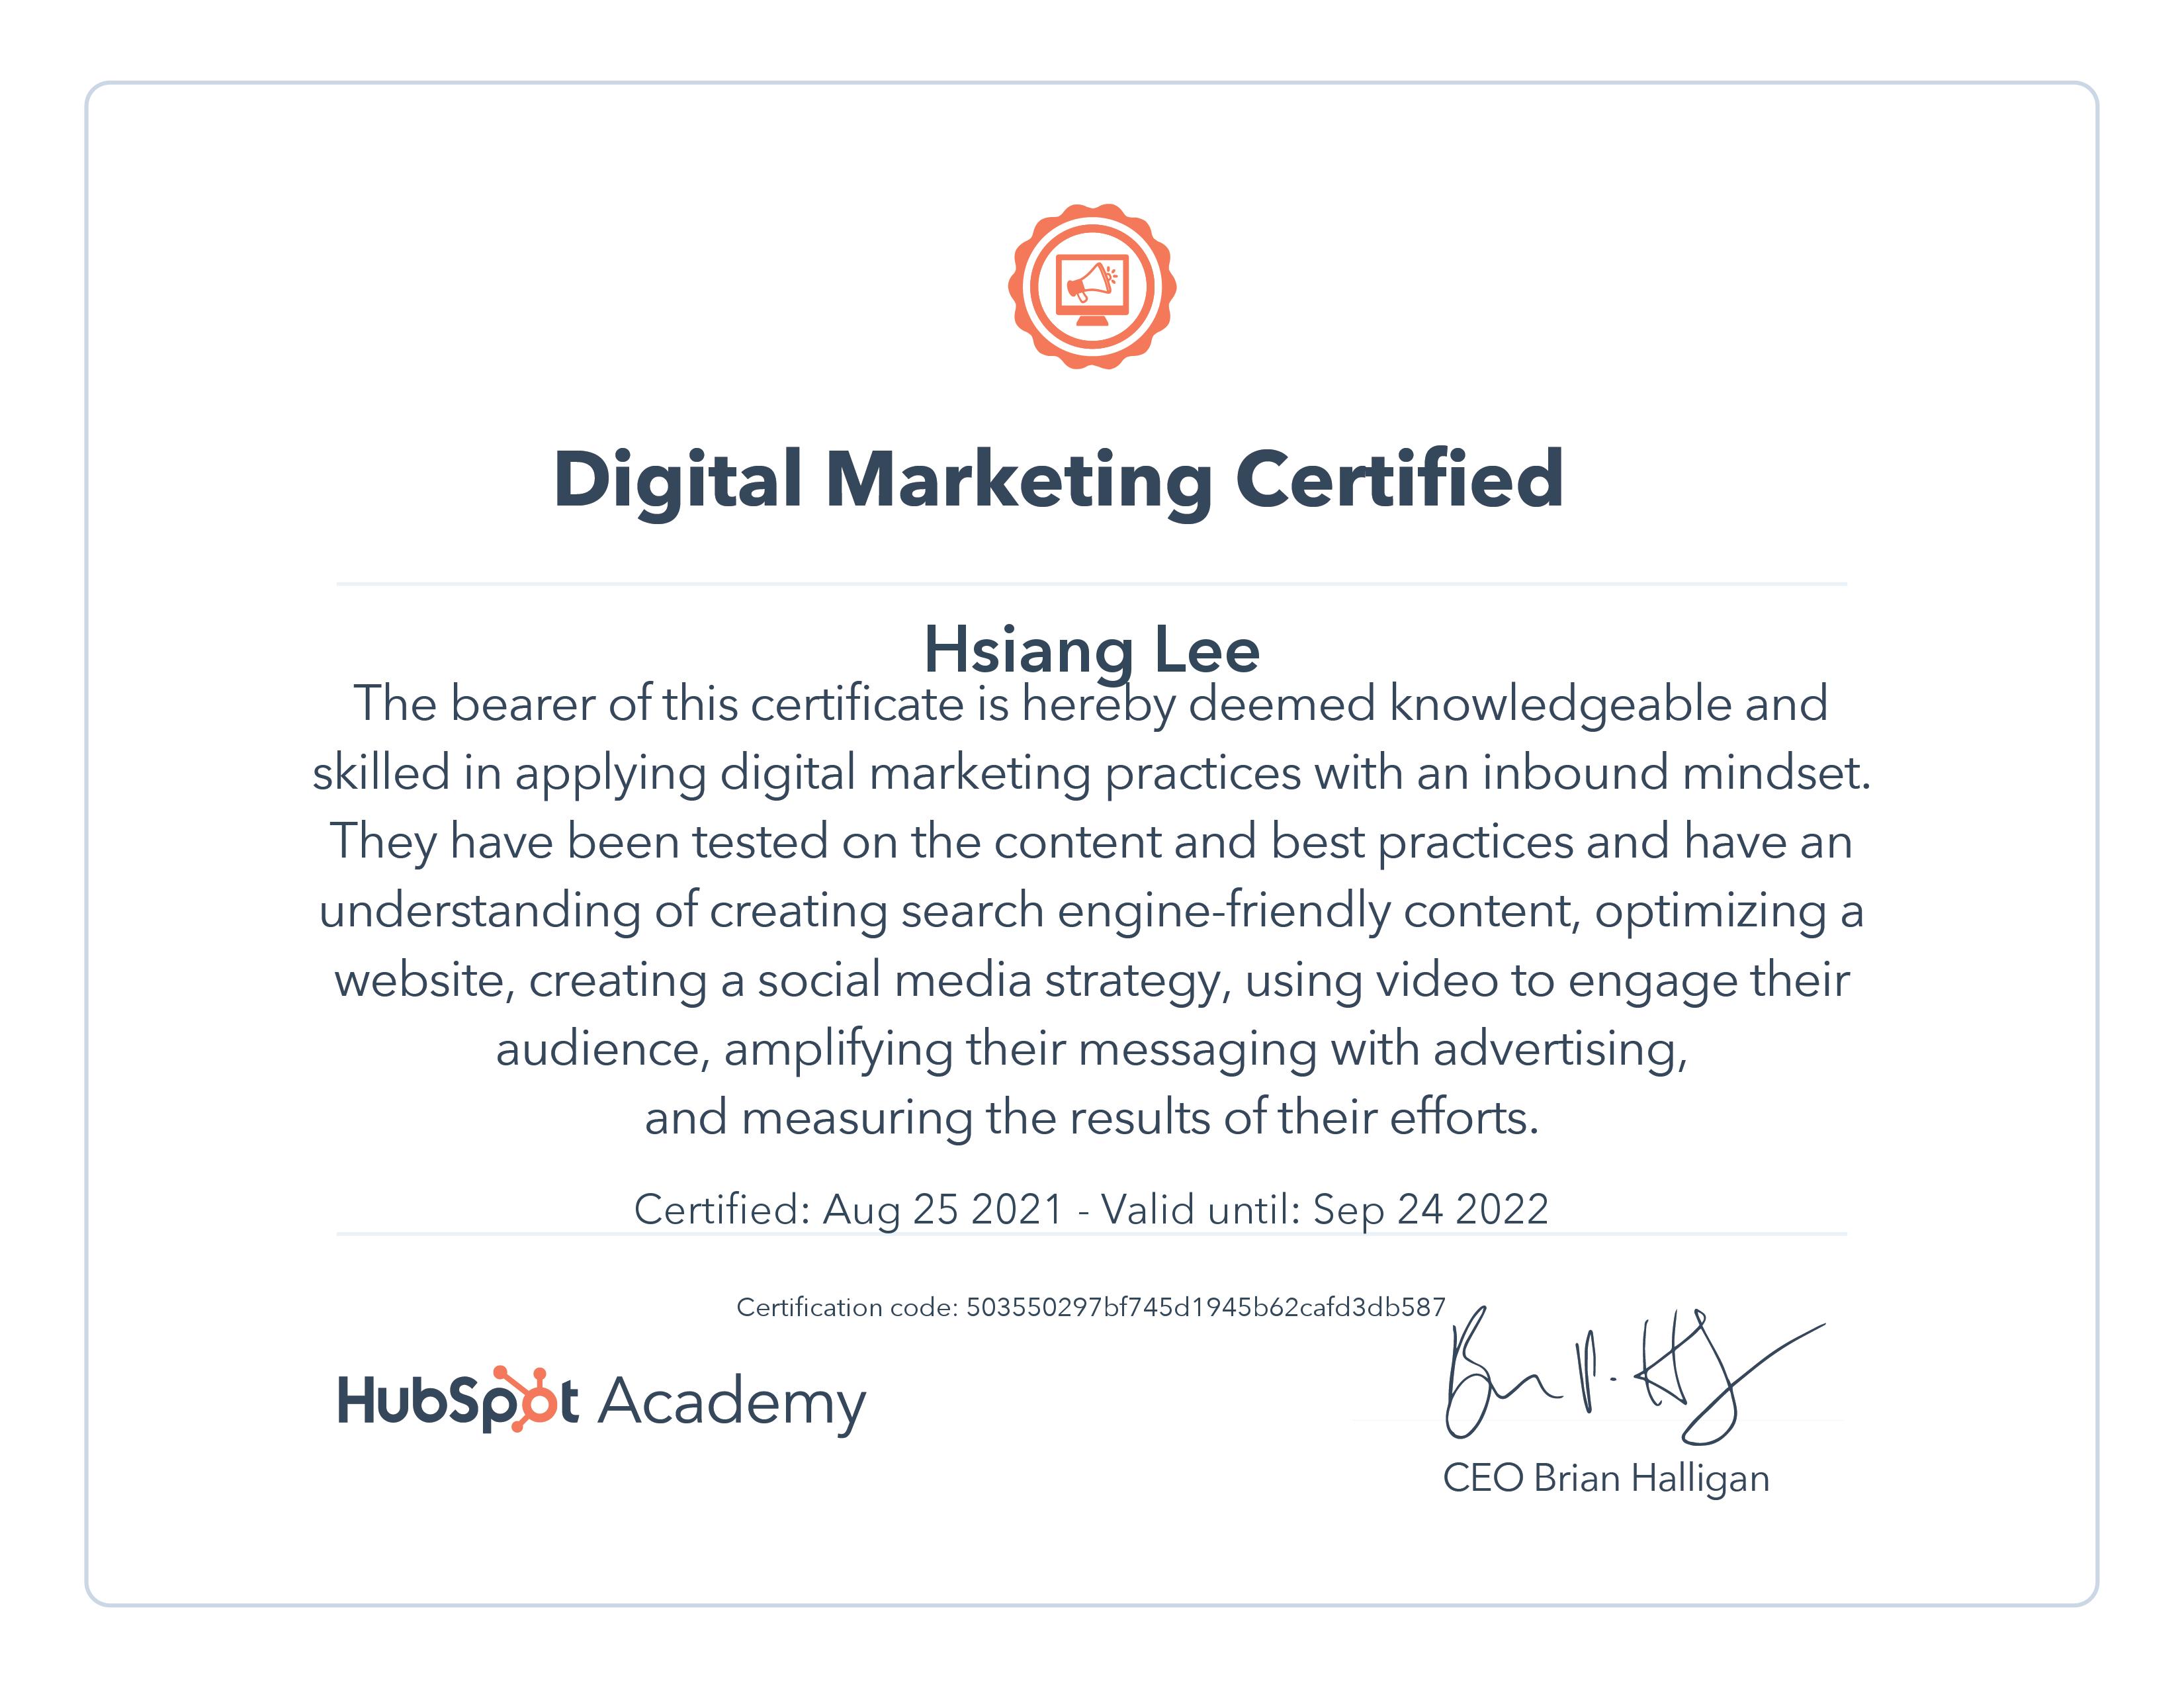 hubspot digital marketing certified